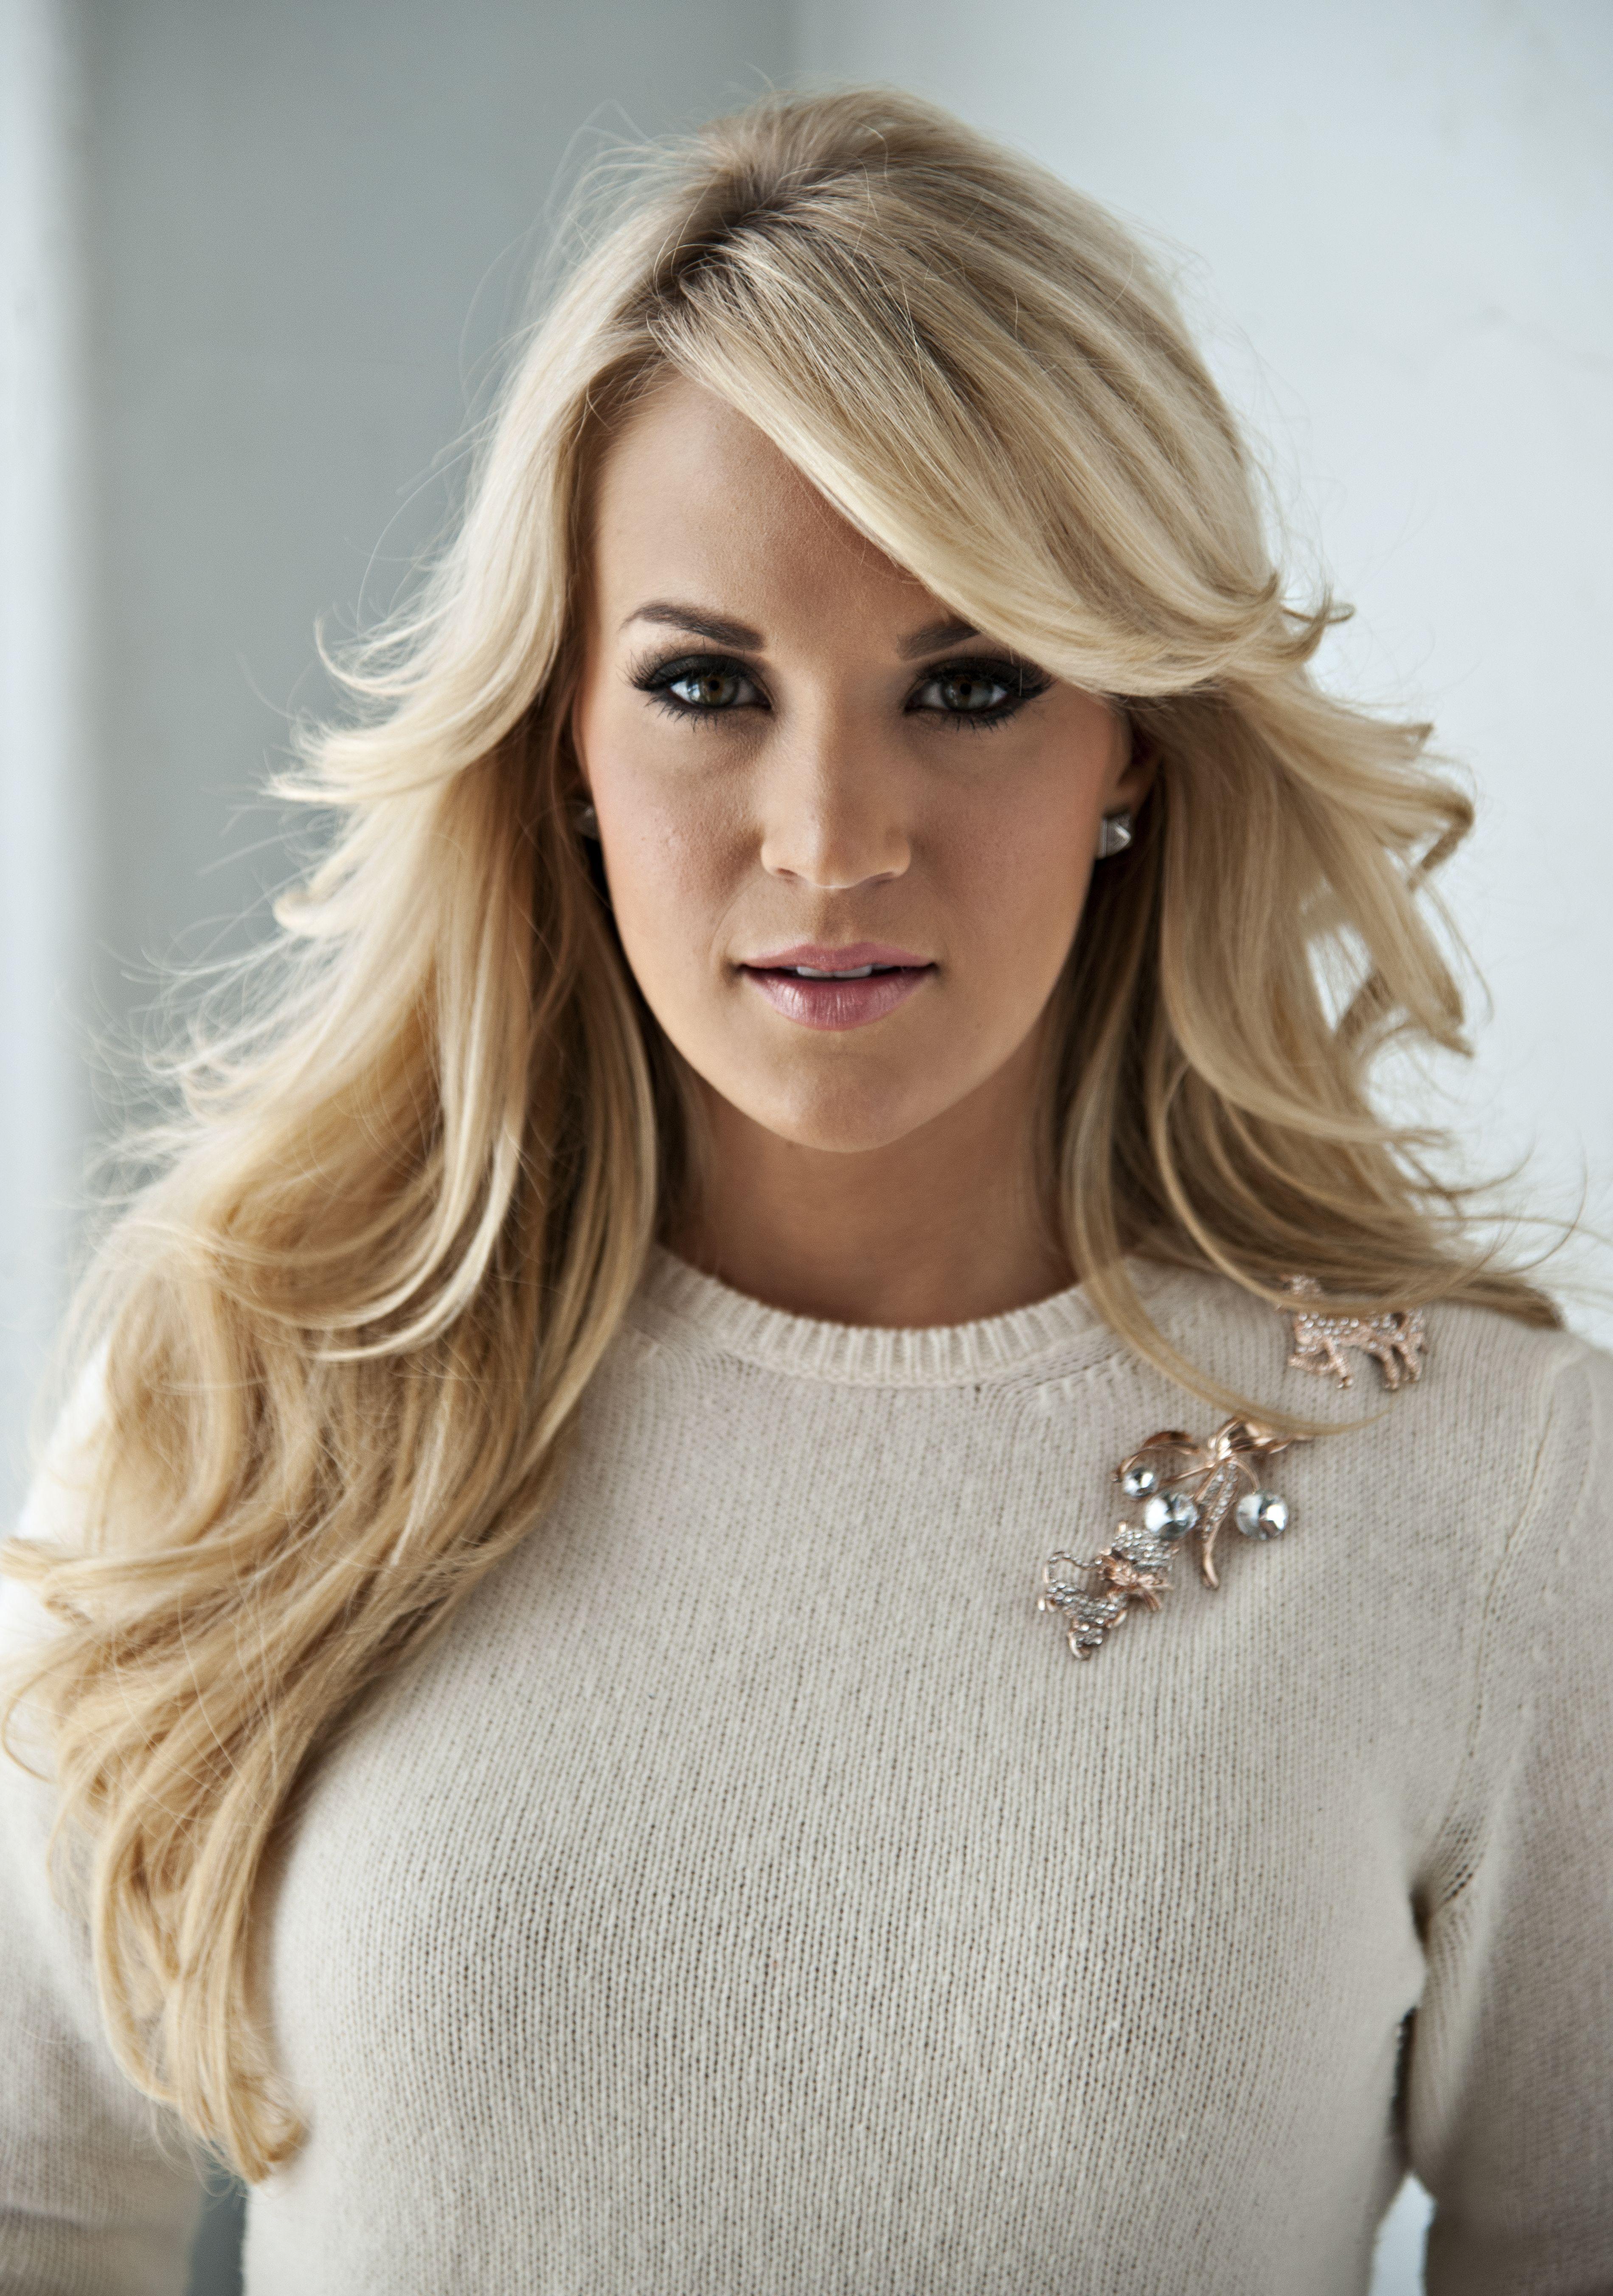 Carrie Underwood | Hair & Make Up. | Pinterest | My hair, Style ...